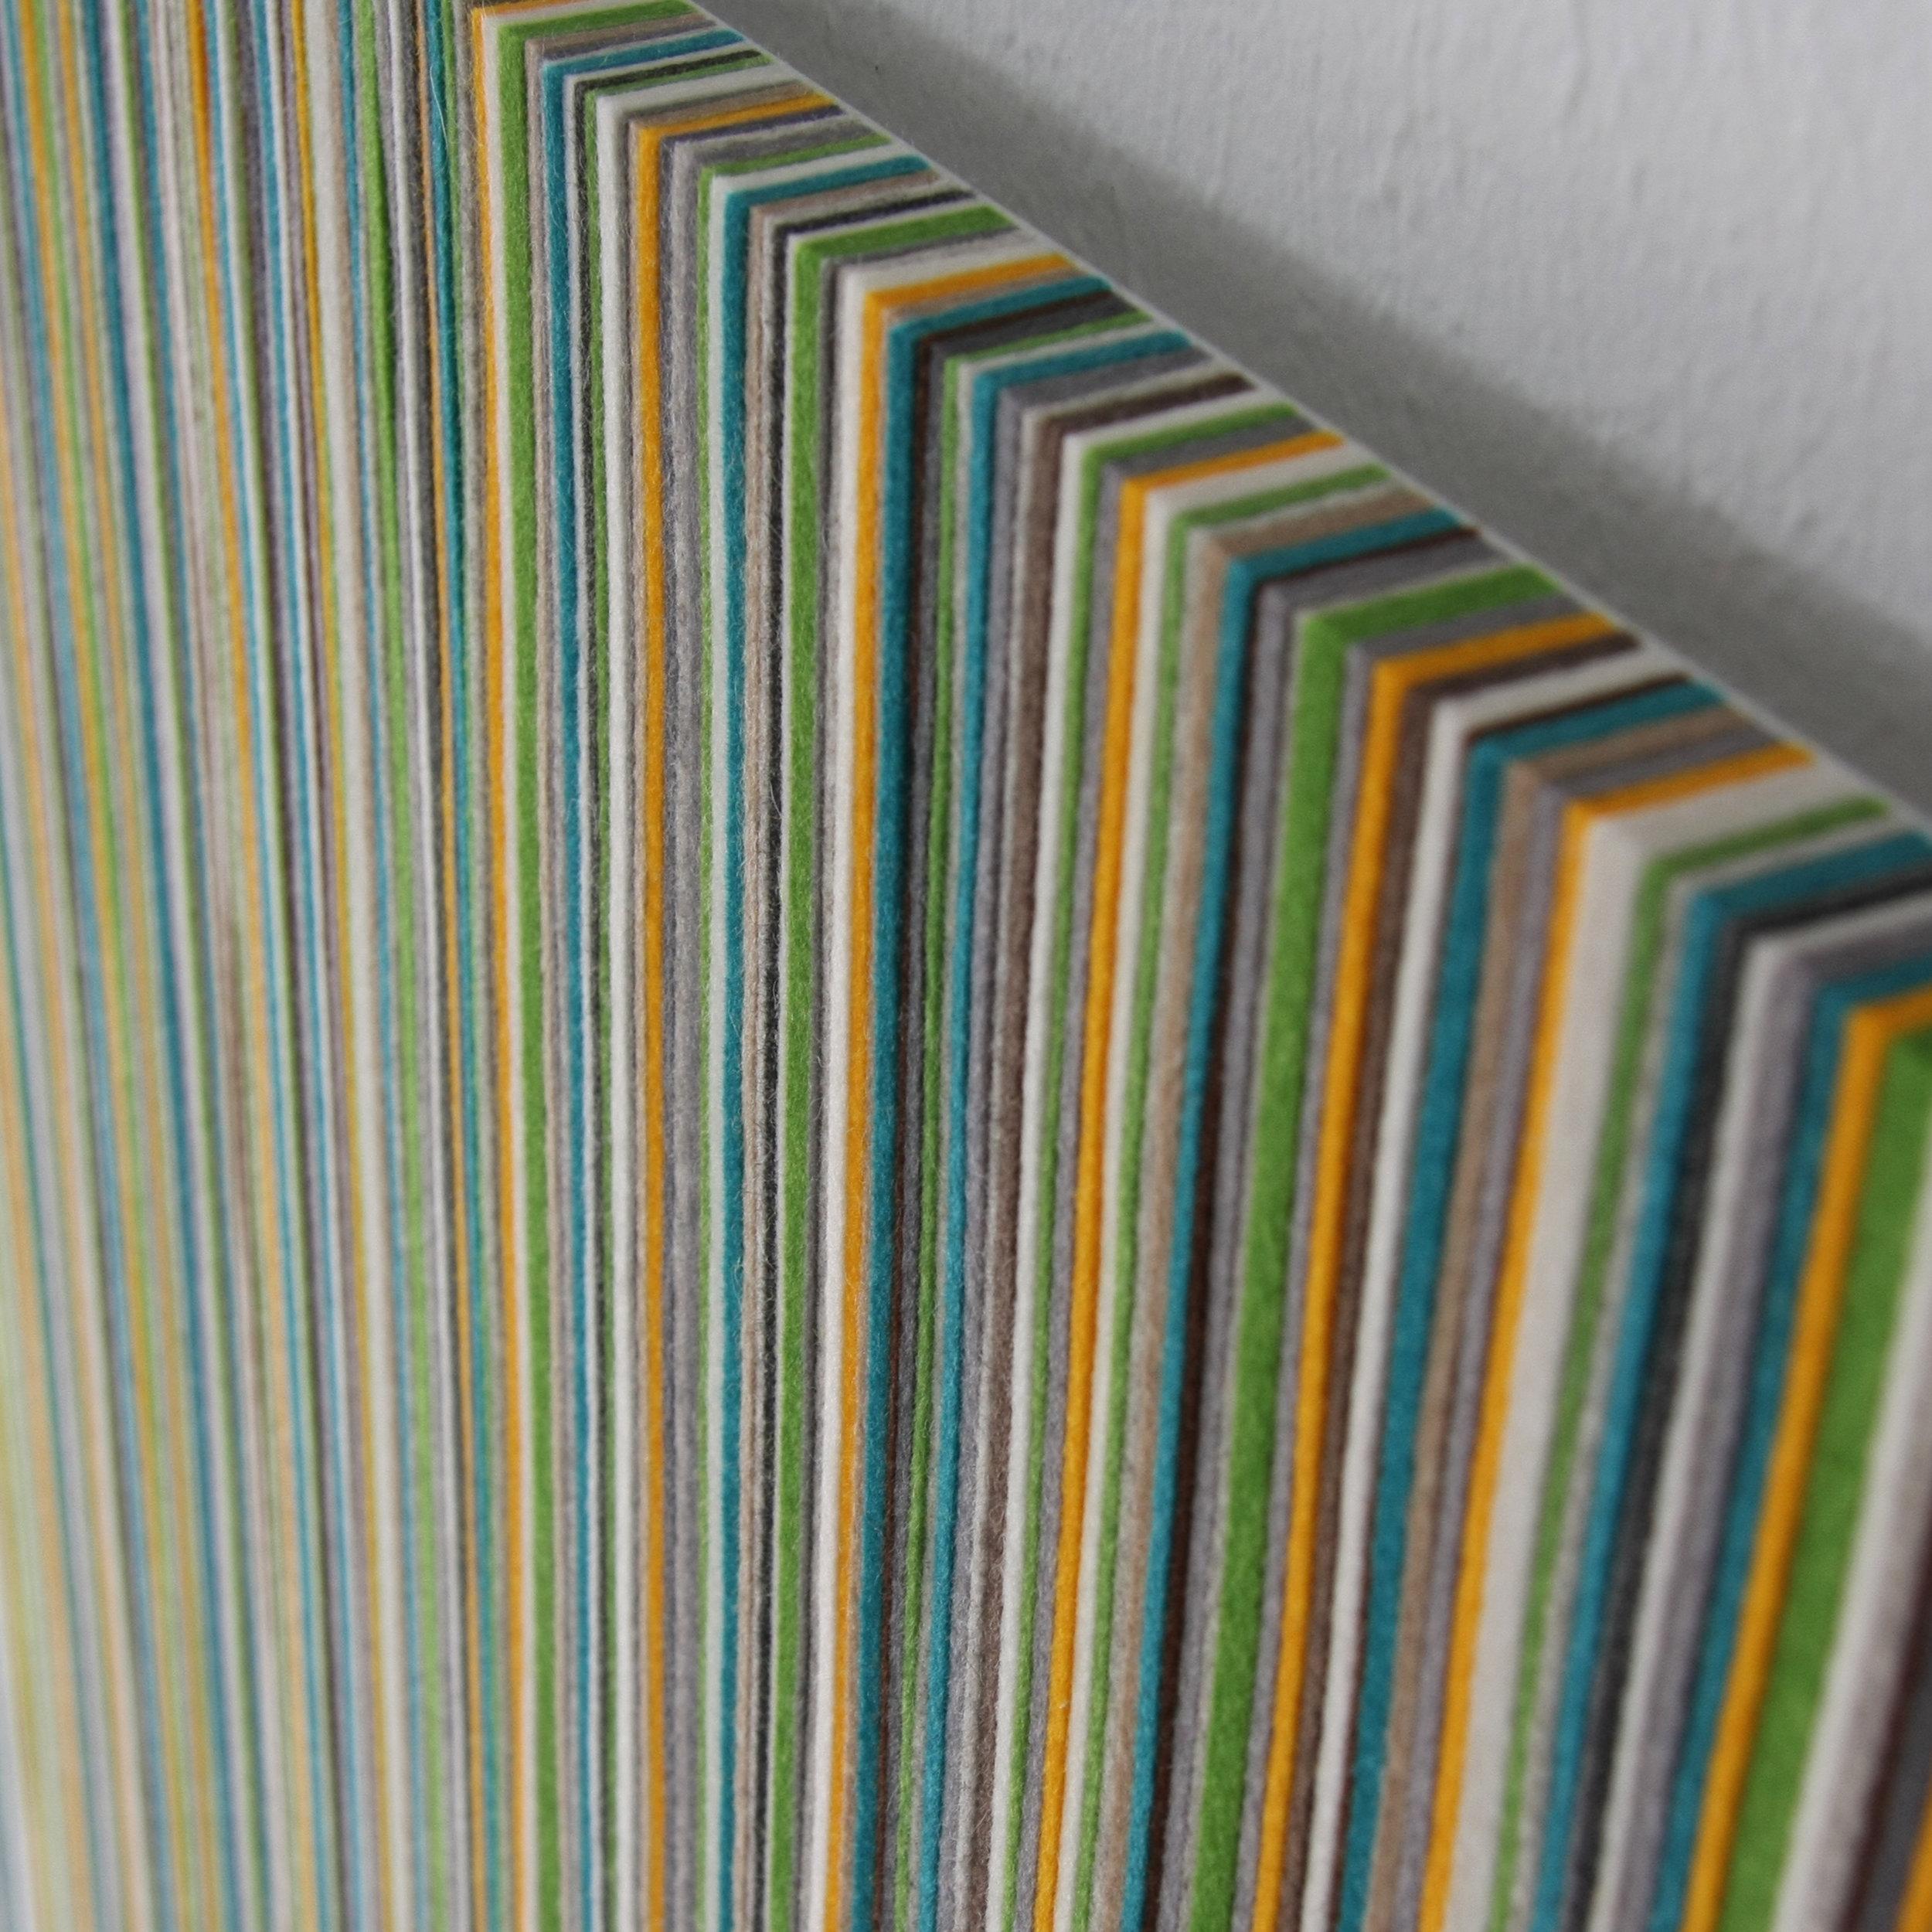 071 Wall Panel - Green / Blue / Yellow